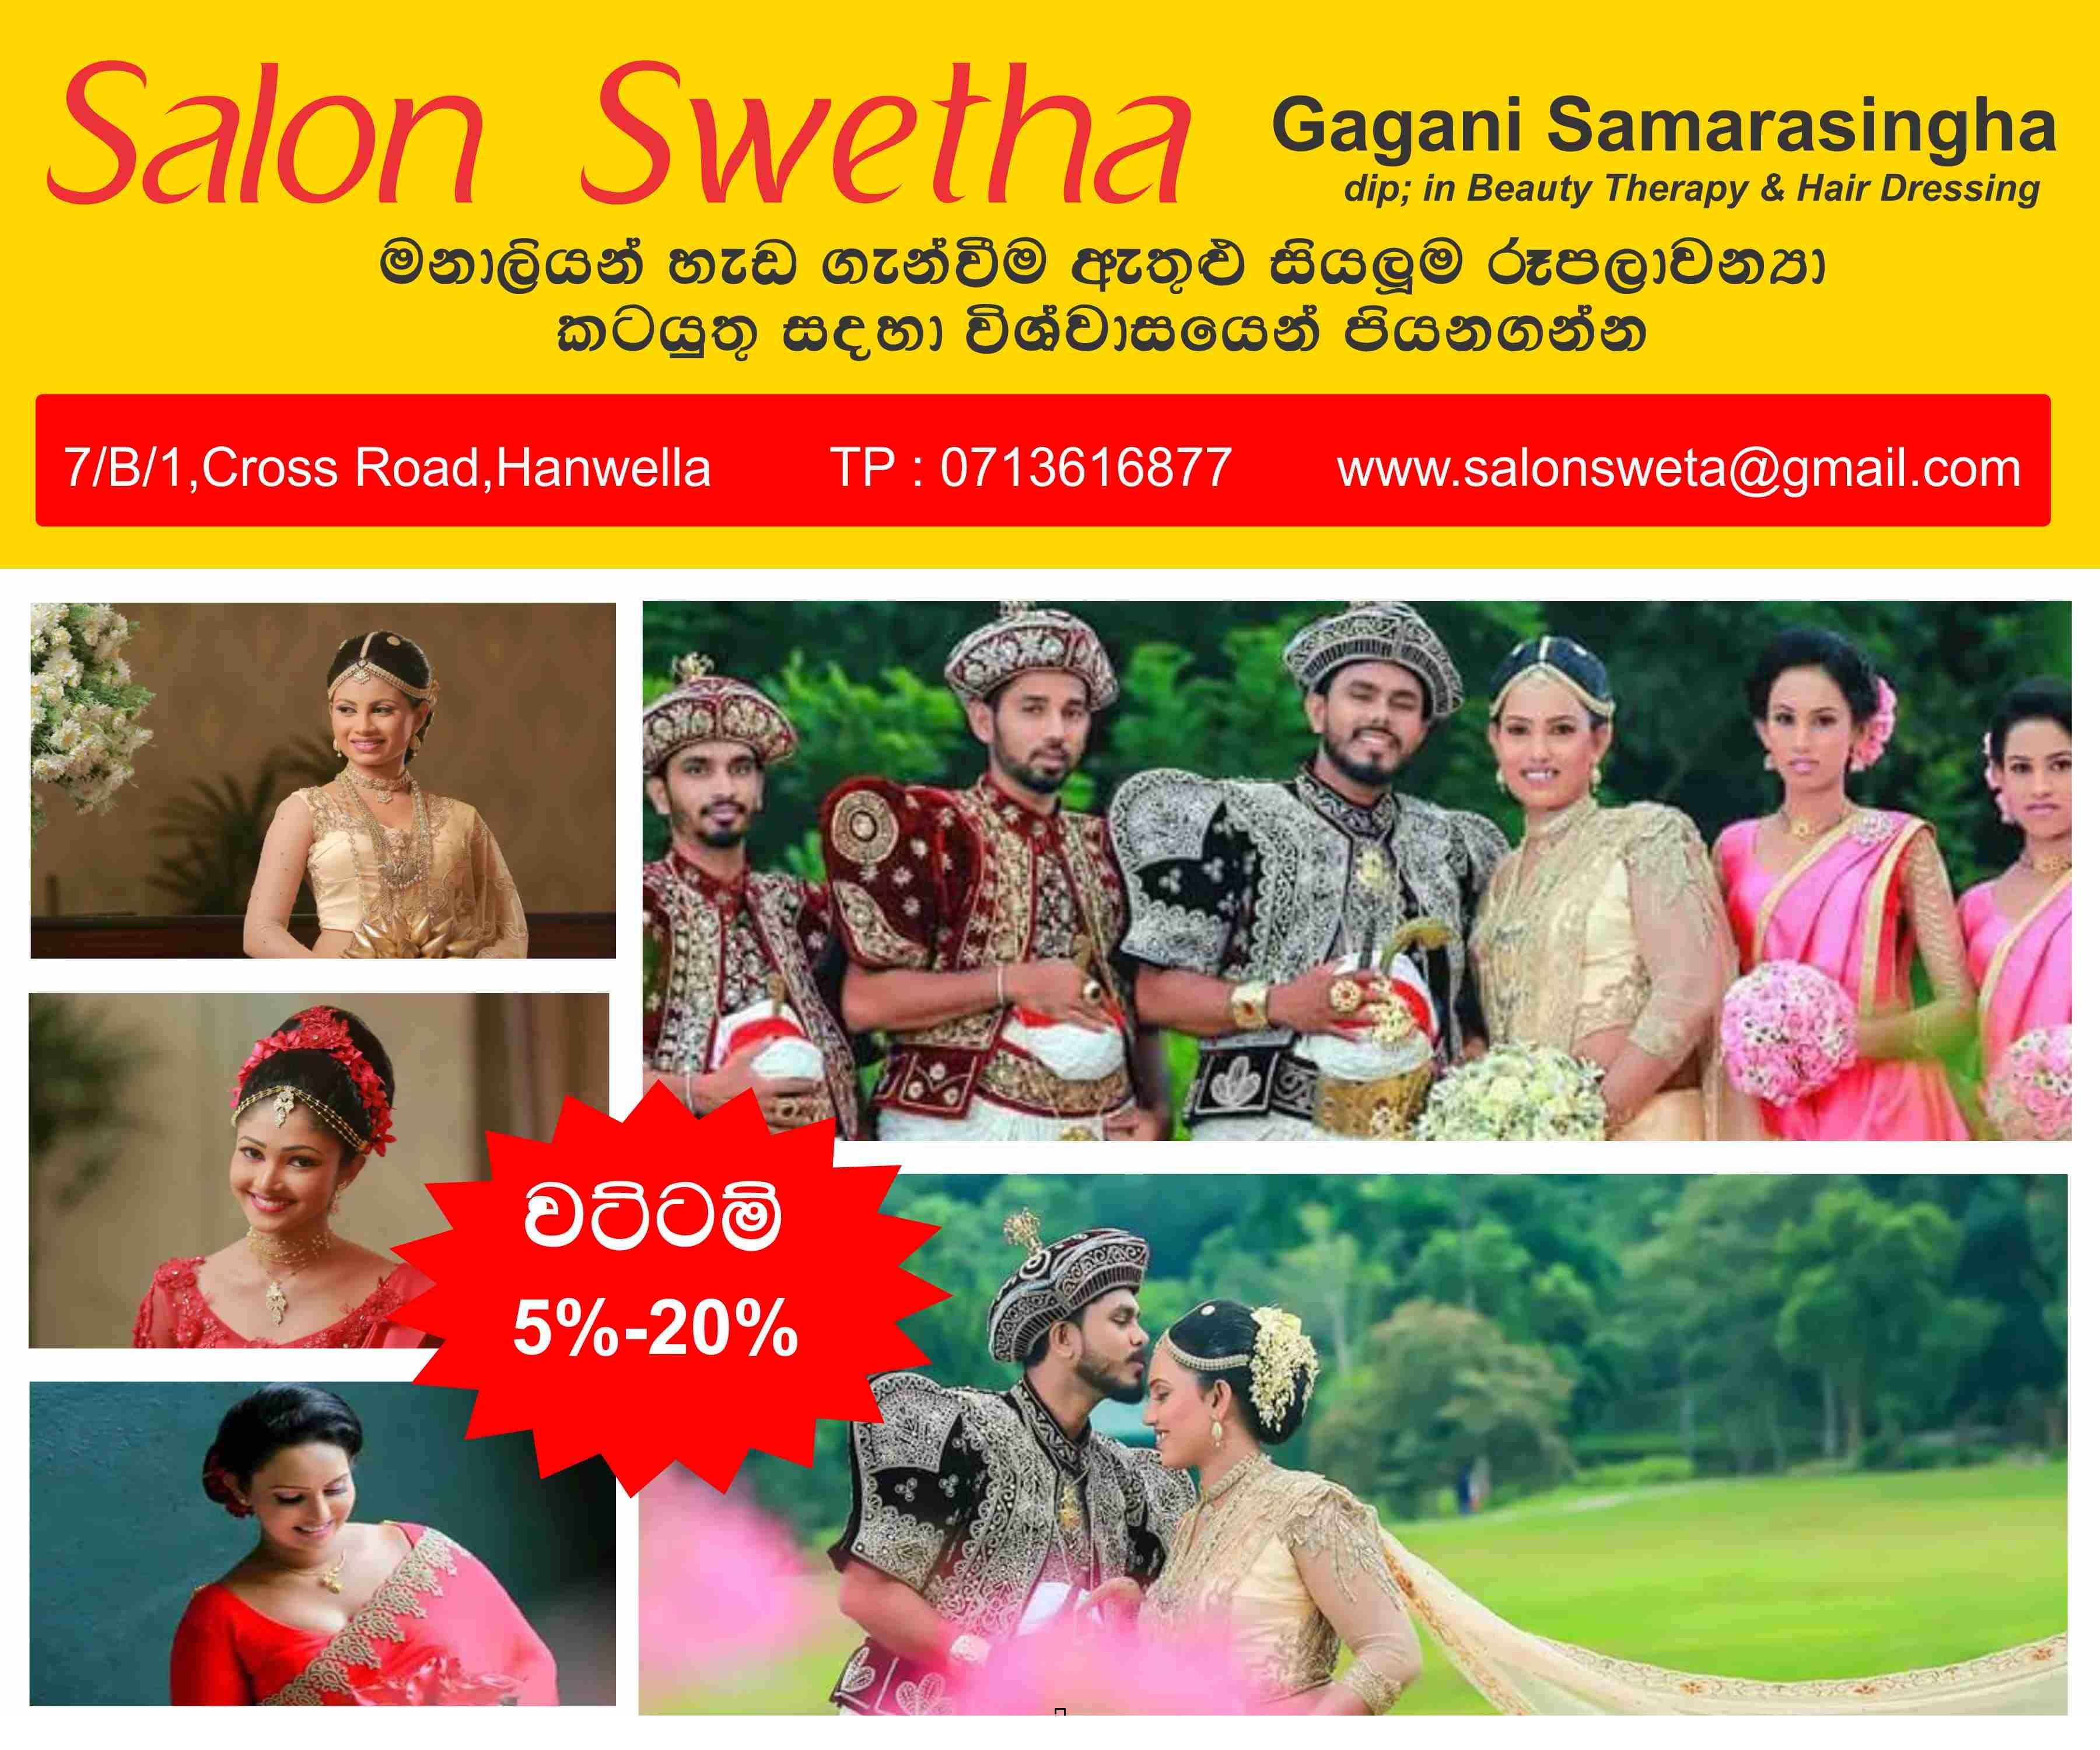 Salon Swetha